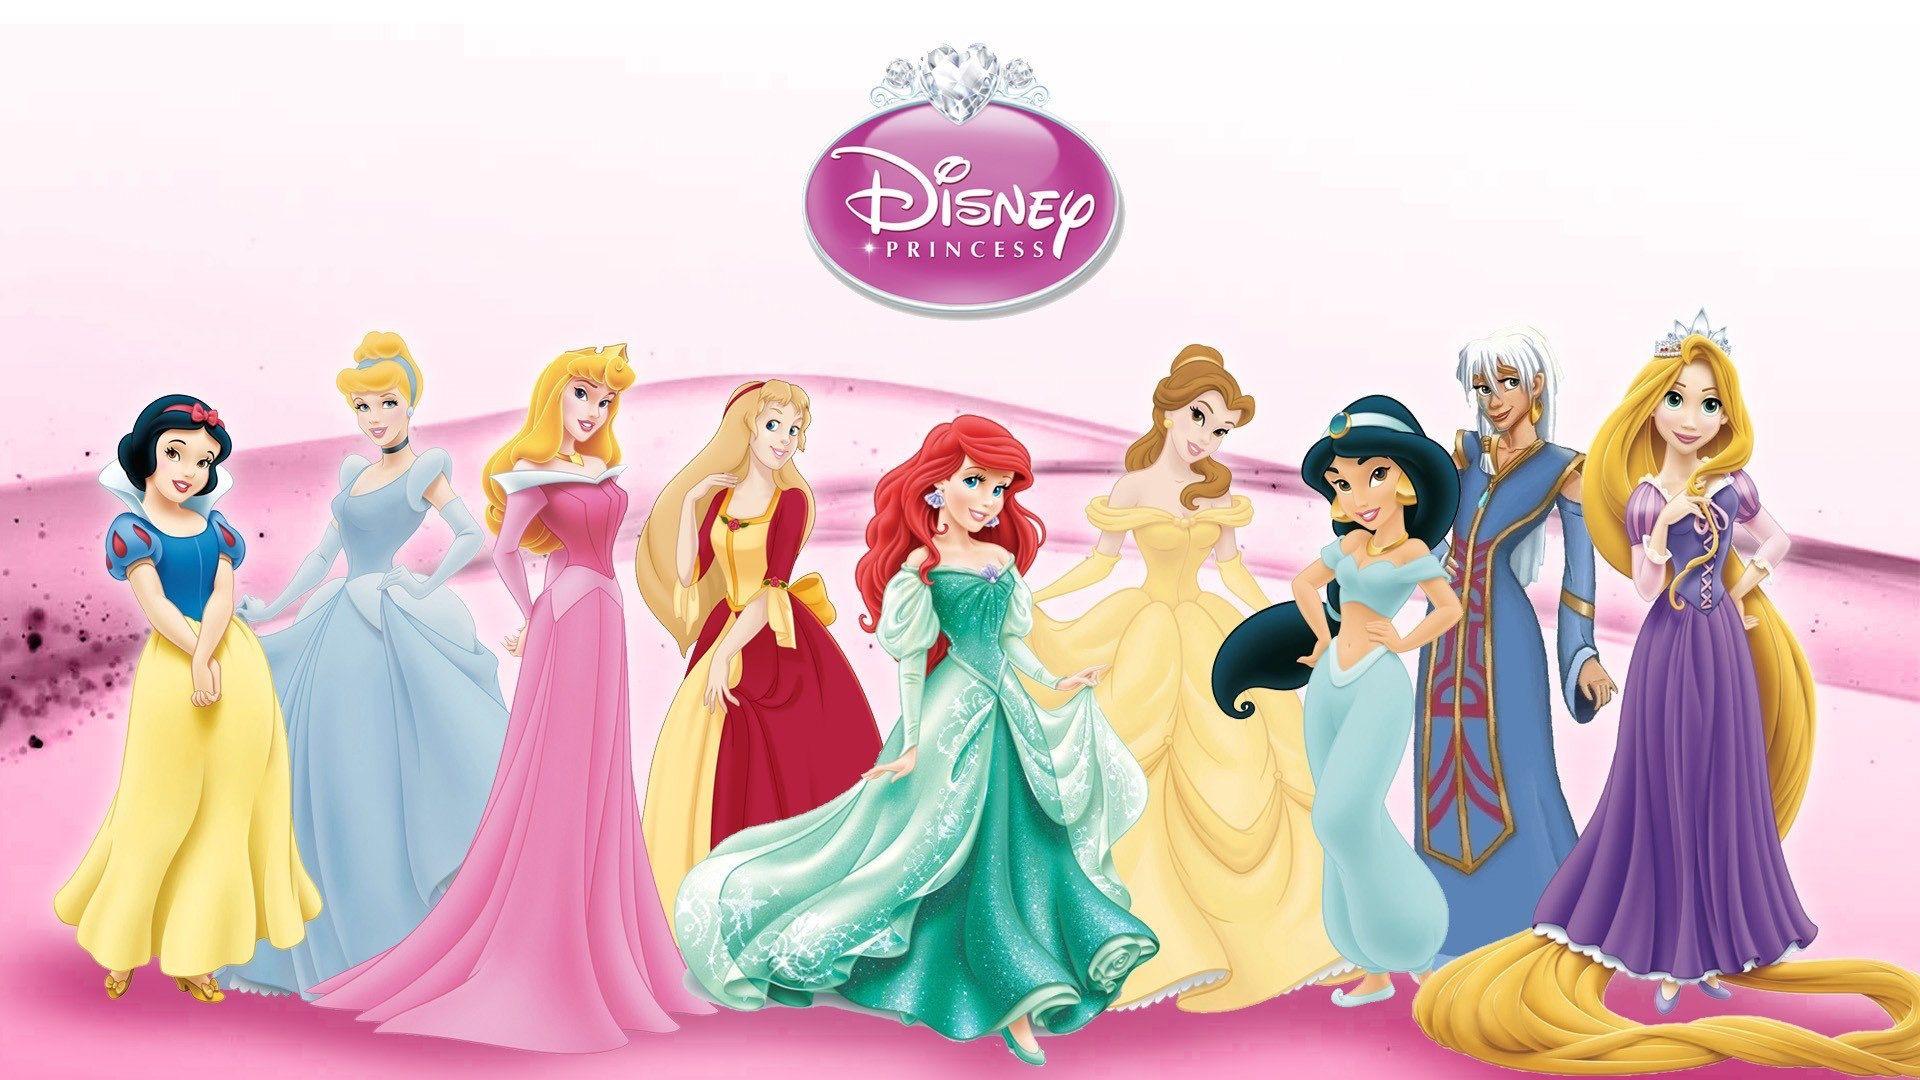 Pin By Analia Catena On Disney Princess Princess Wallpaper Disney Princess Images Disney Princess Background